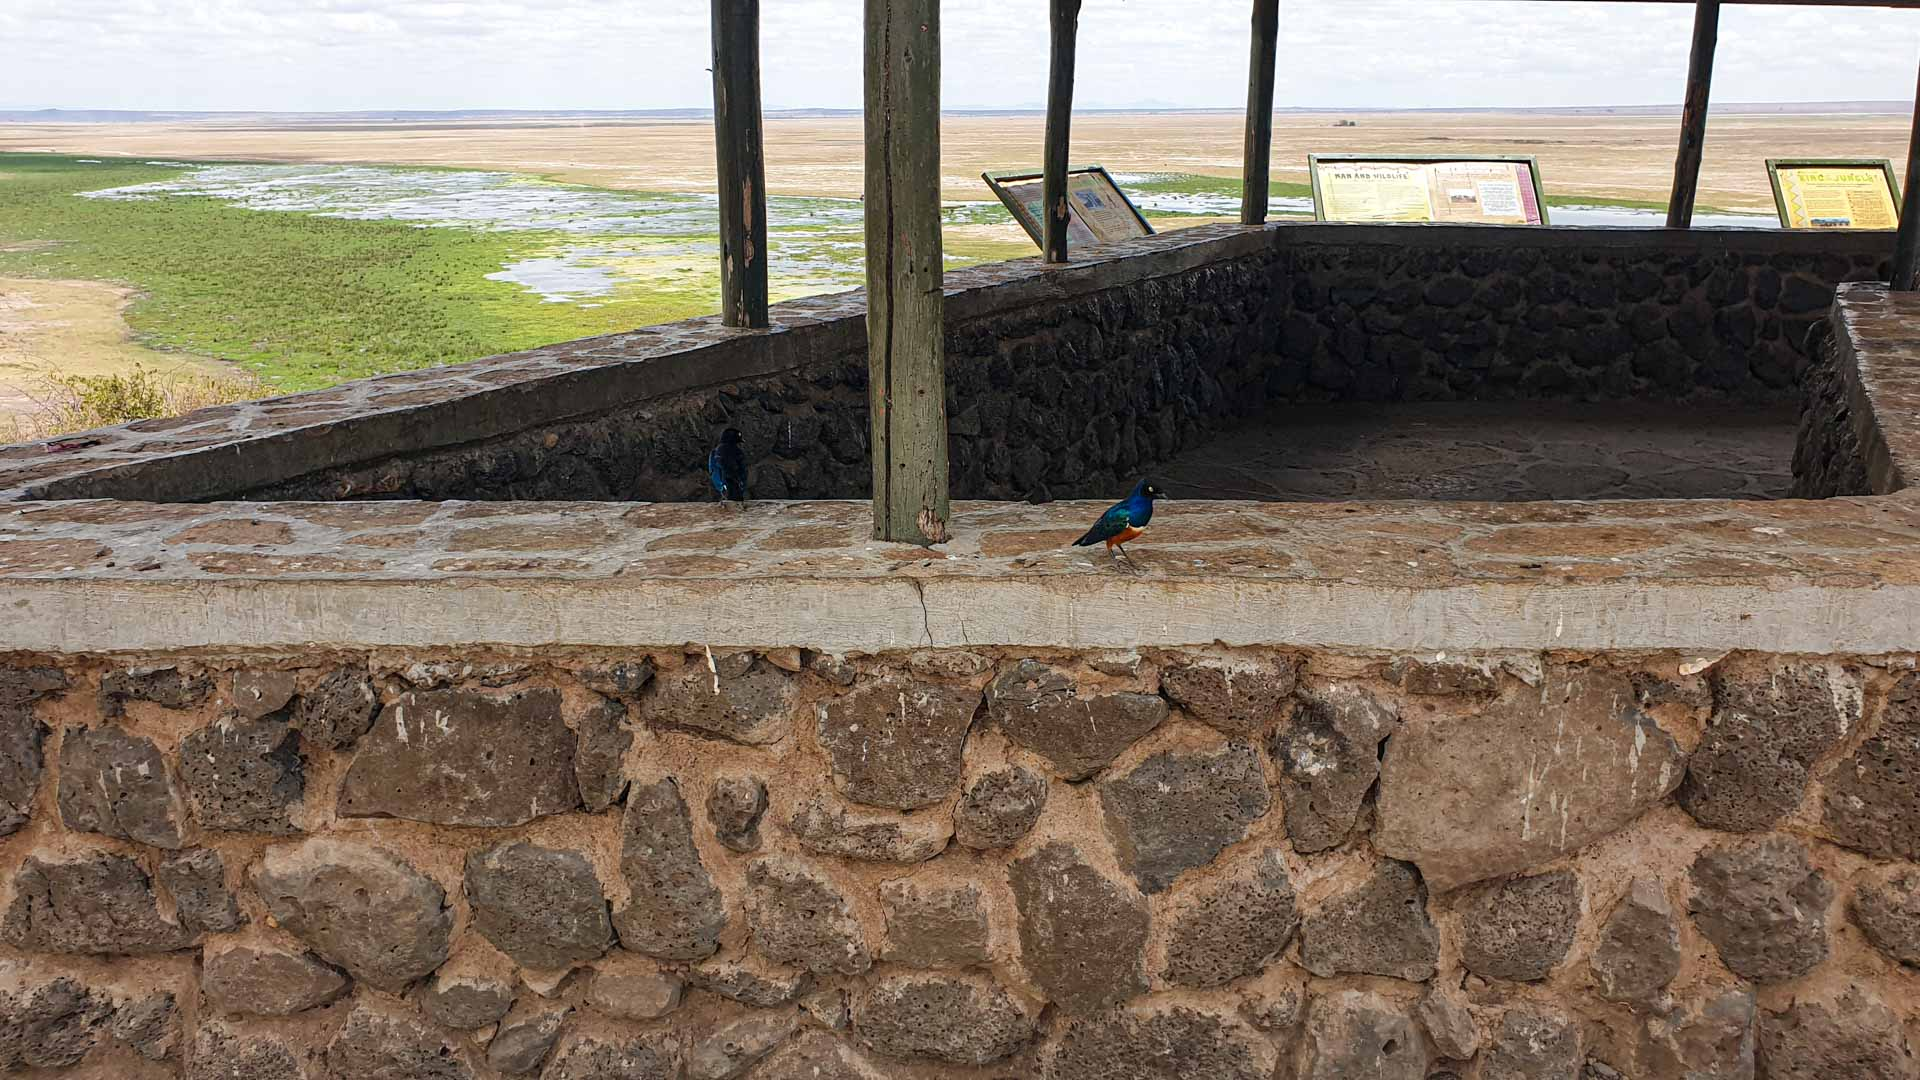 Starling magnífico, Amboseli, Kenia